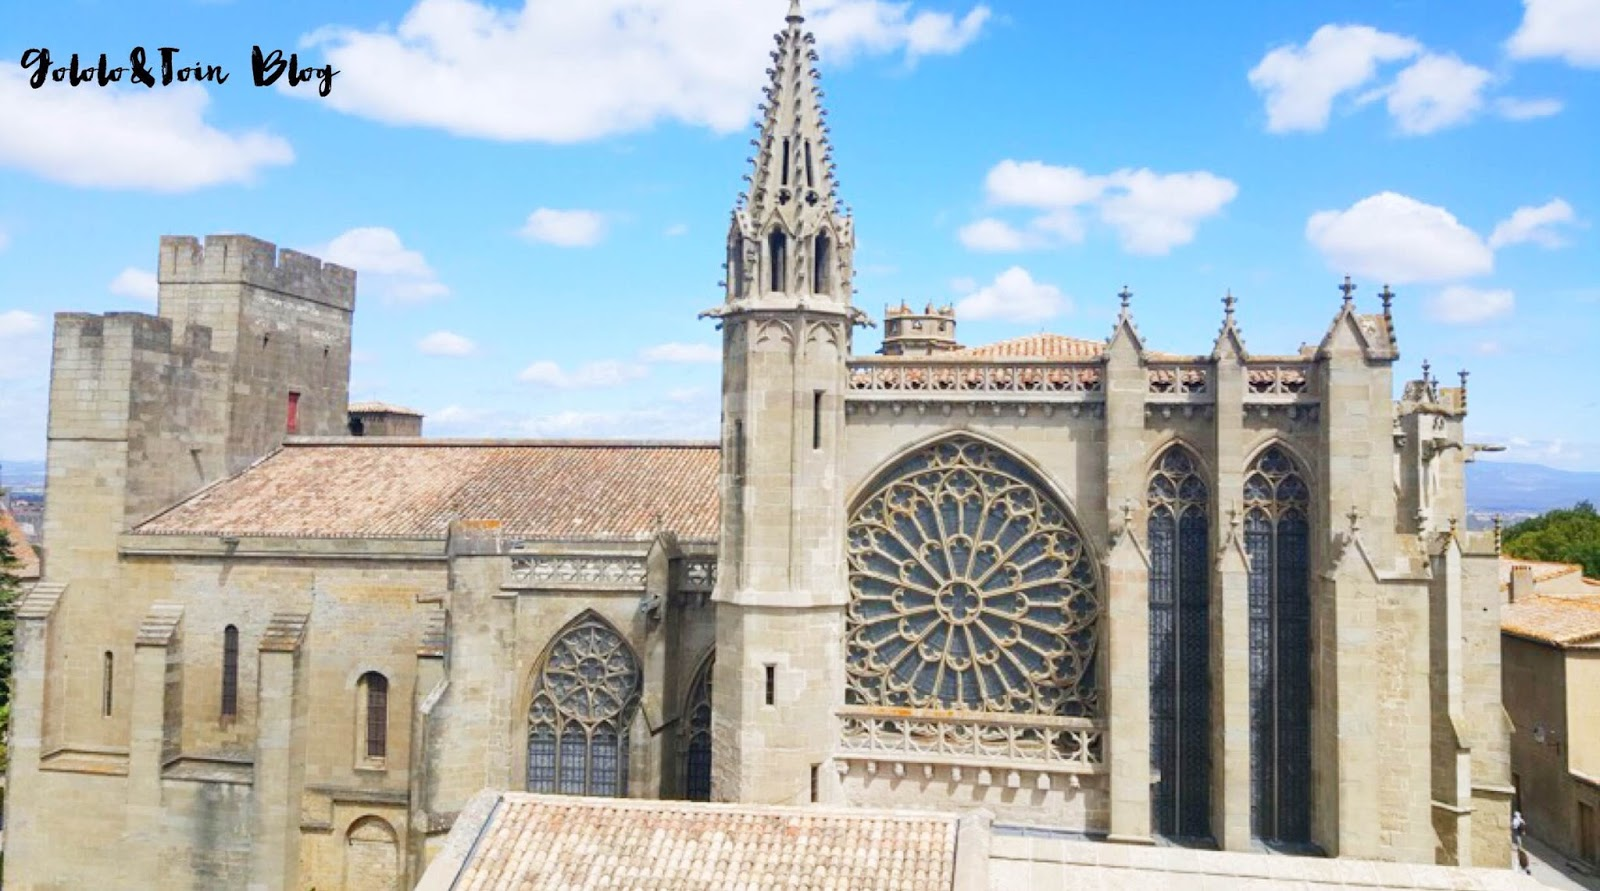 Carcasona-carcassonne-catedral-basilica-saint-nazarie-gotico-romanico-arquitectura-viajar-con-niños-sur-de-francia